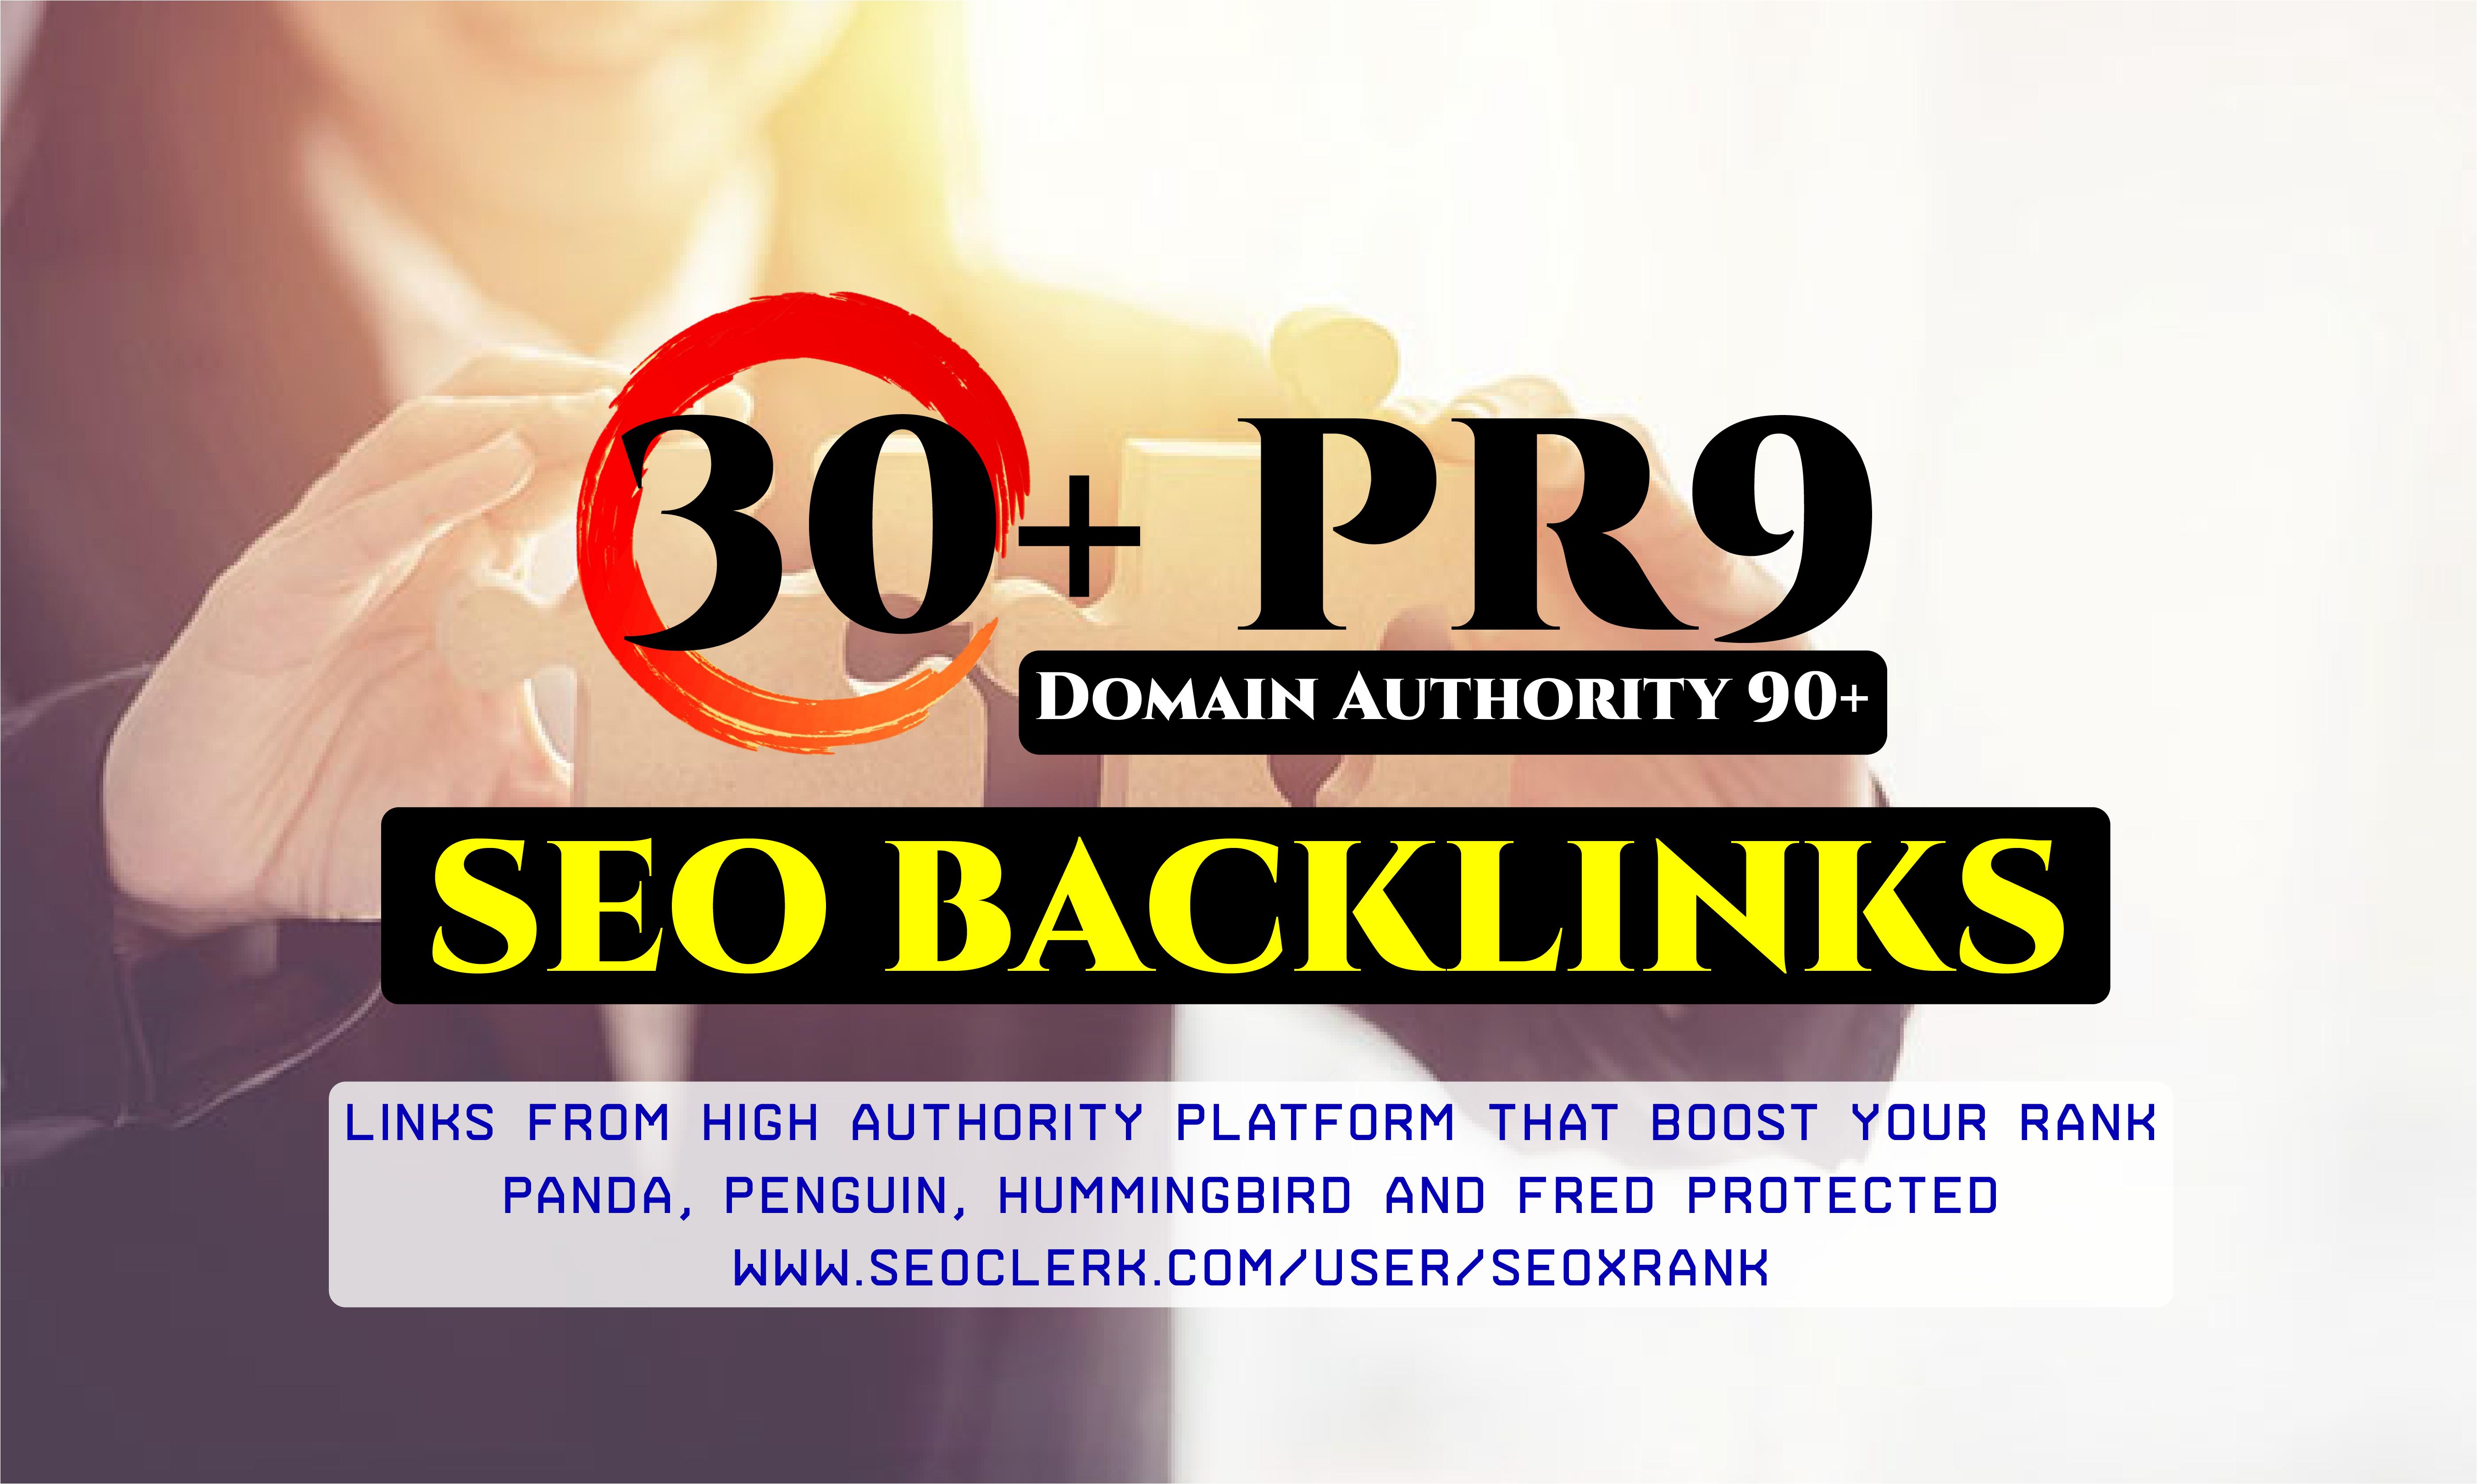 30+ Pr9 - DA 90+ High Authority SEO Backlinks - Fire Your Google Ranking 2021